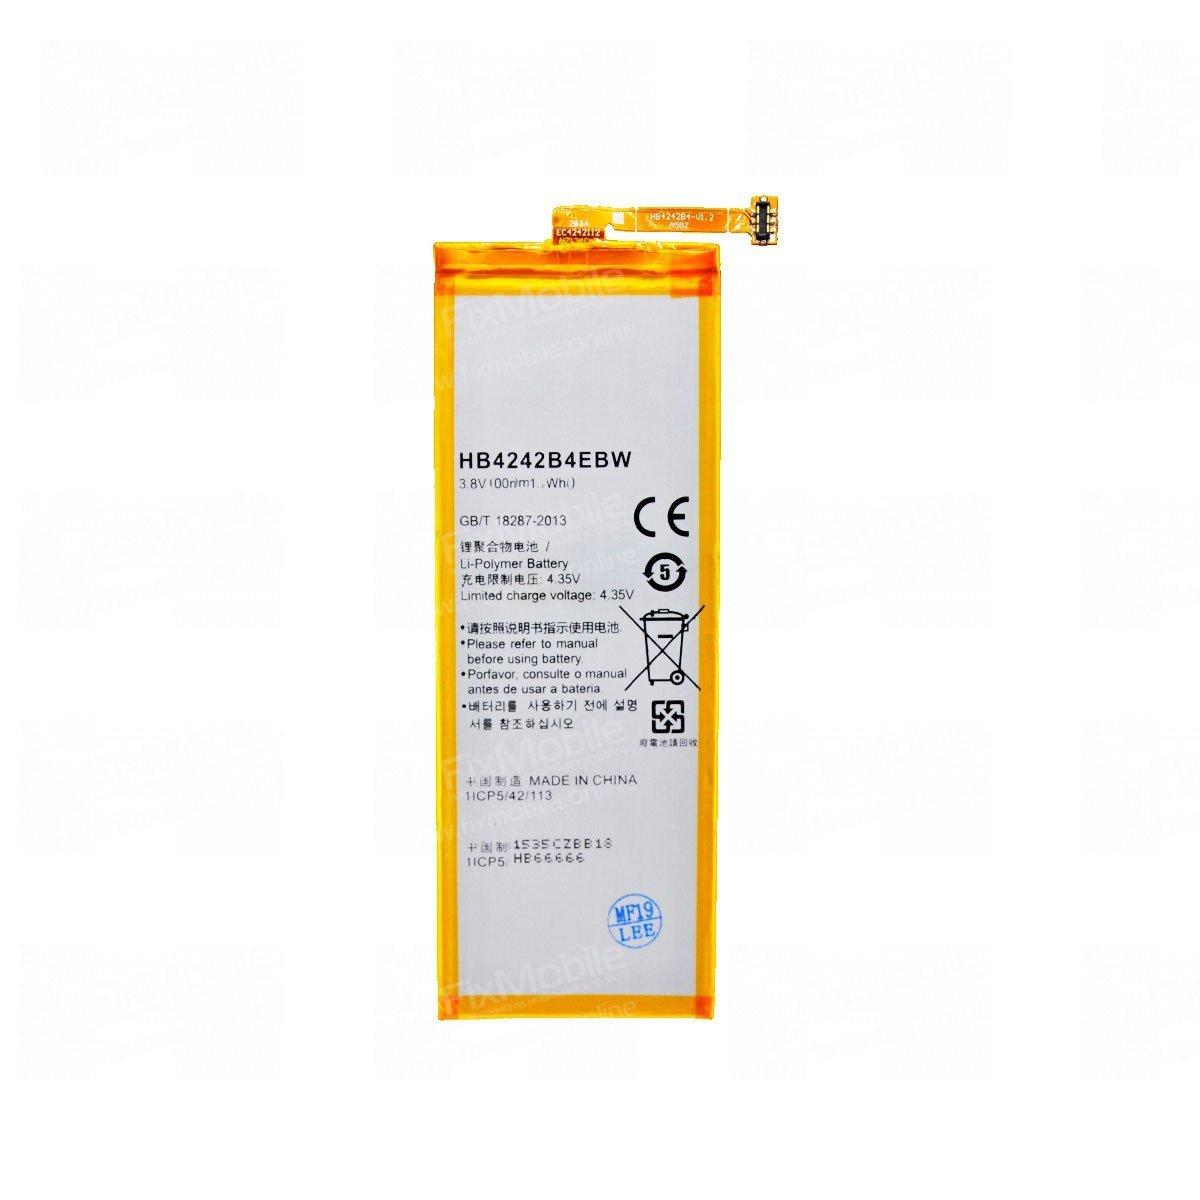 Аккумуляторная батарея для Huawei Honor 4X HB4242B4EBW